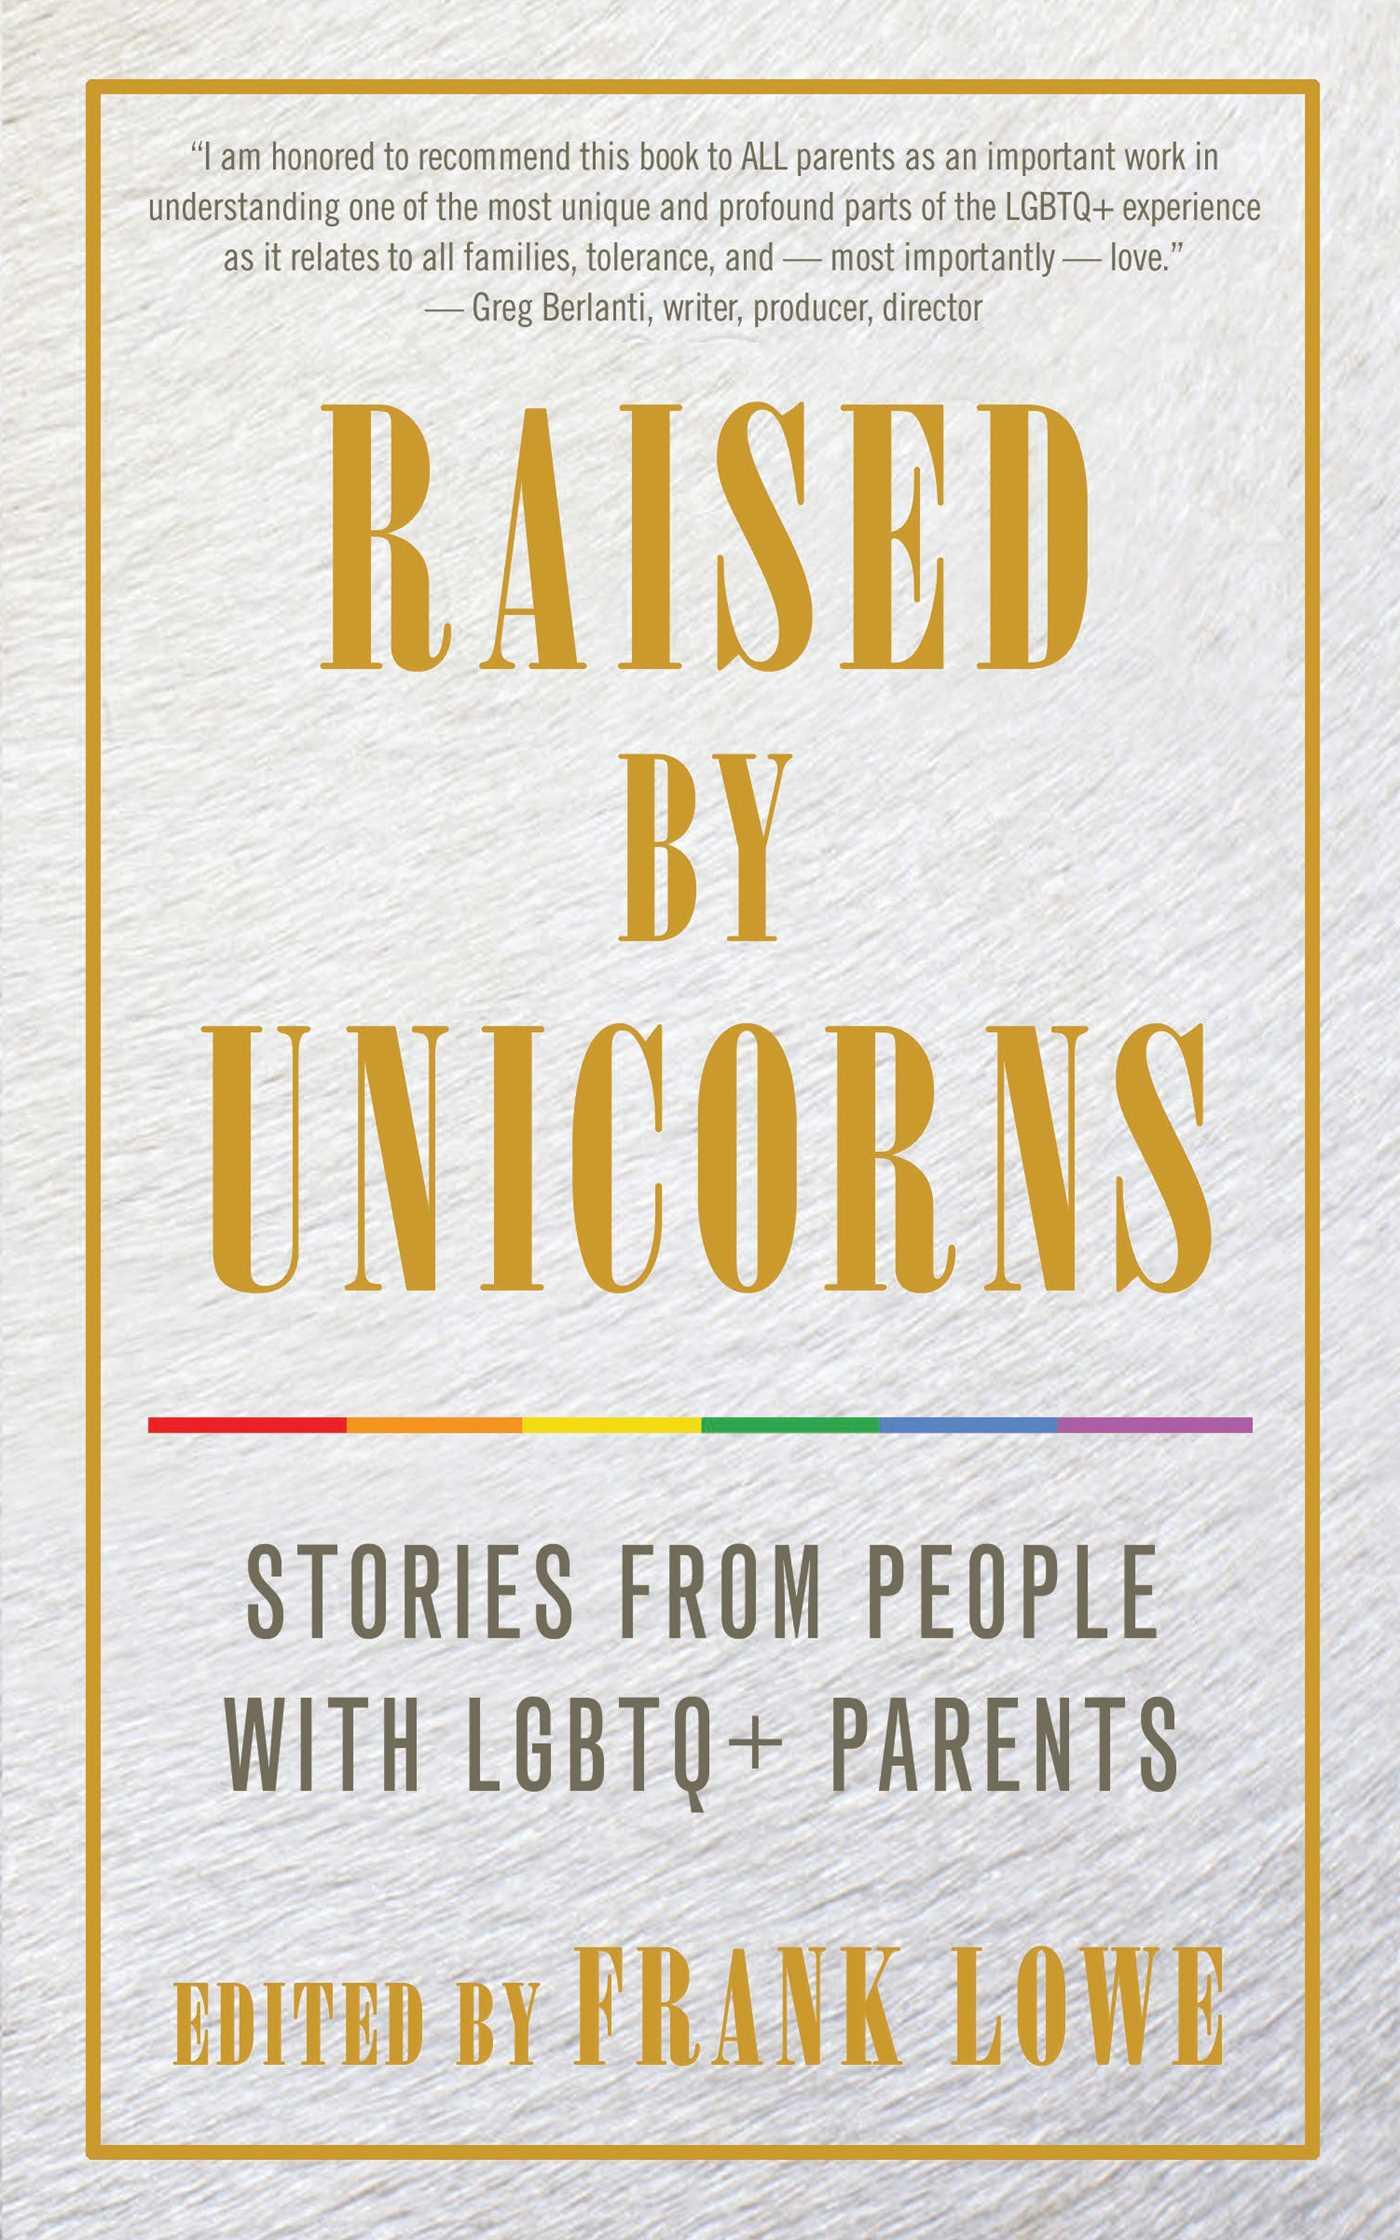 Raised by unicorns 9781627782579 hr